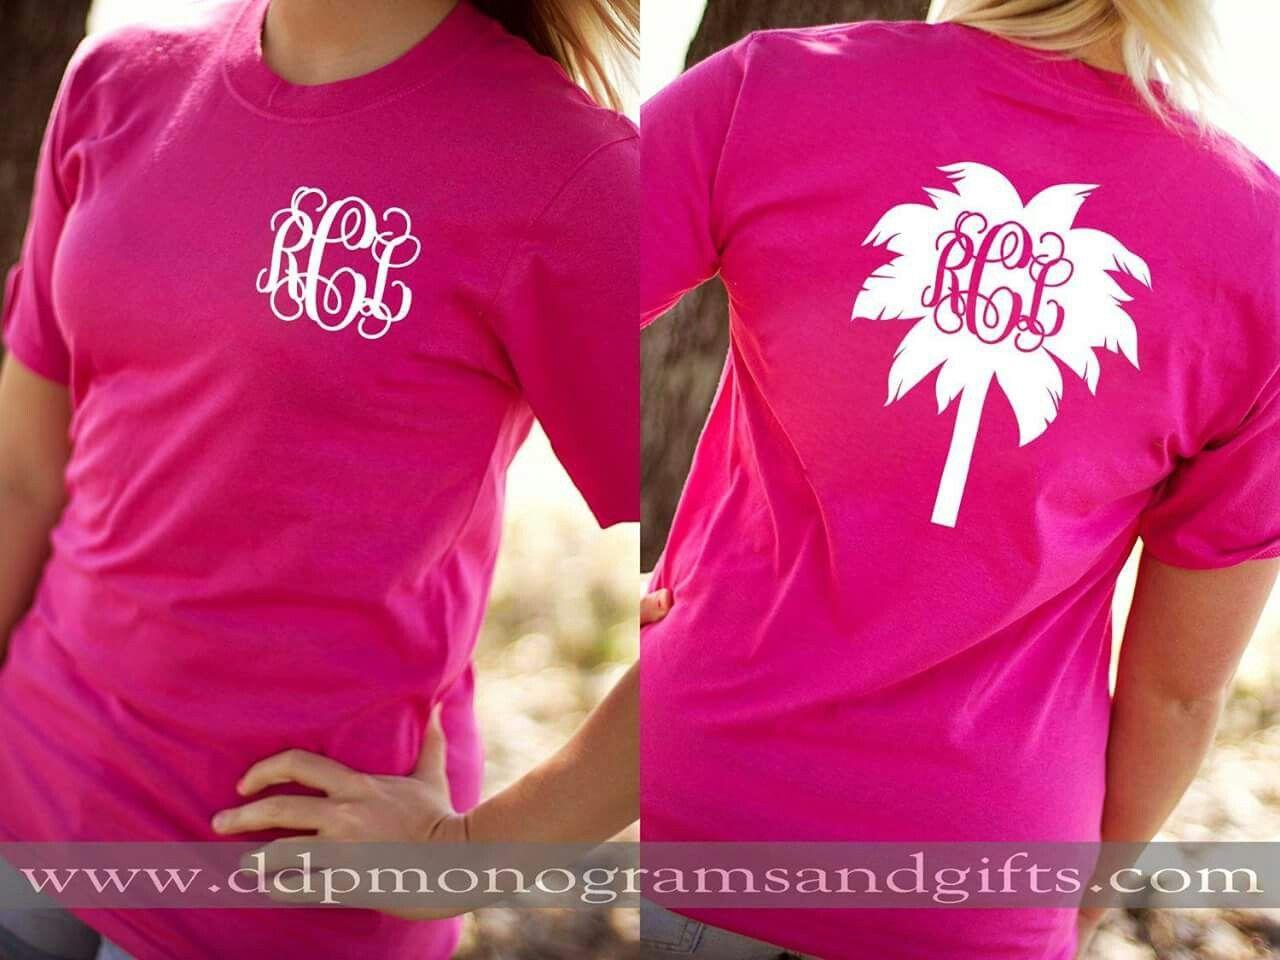 Pin By Penny Jones On Tshirts Vinyl Shirts Monogram T Shirts Monogram Outfit